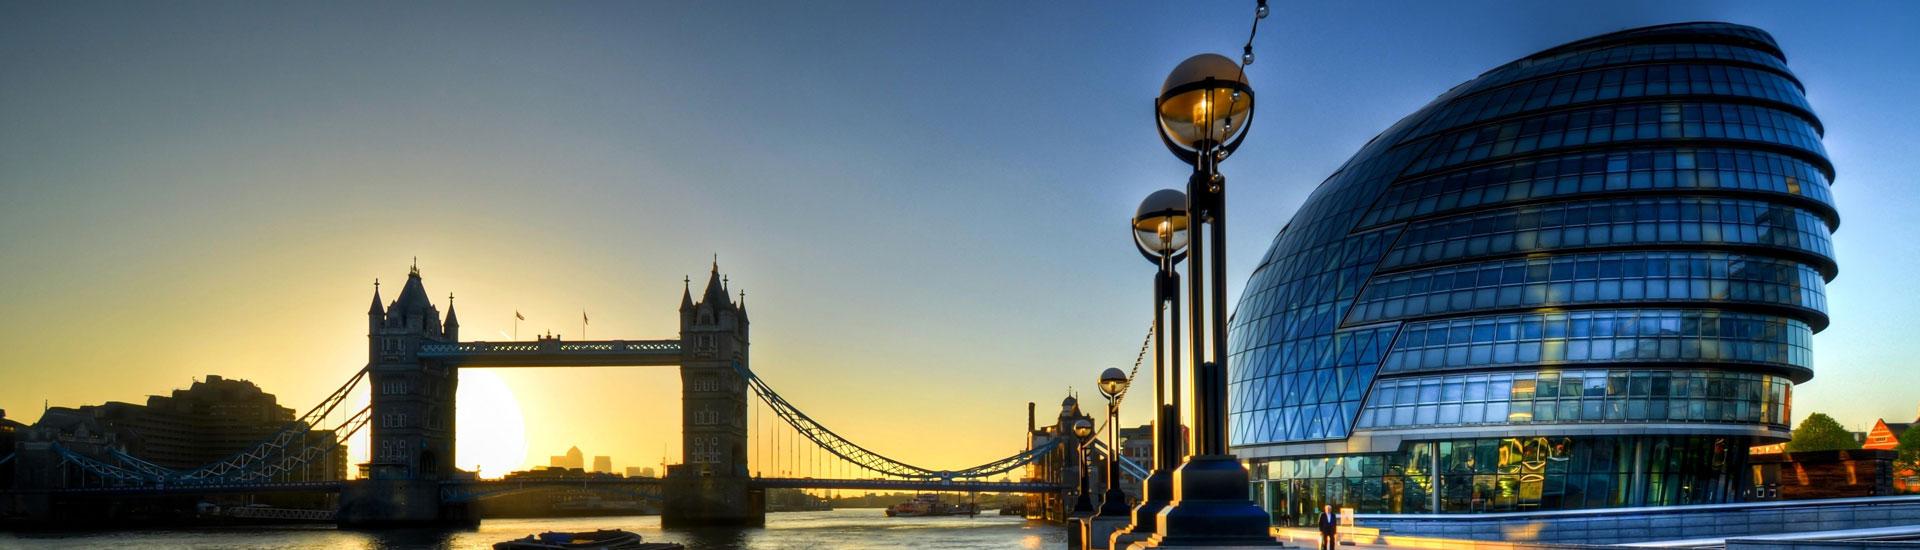 IMMAGINE LONDRA EC - ESTATE INPSIEME